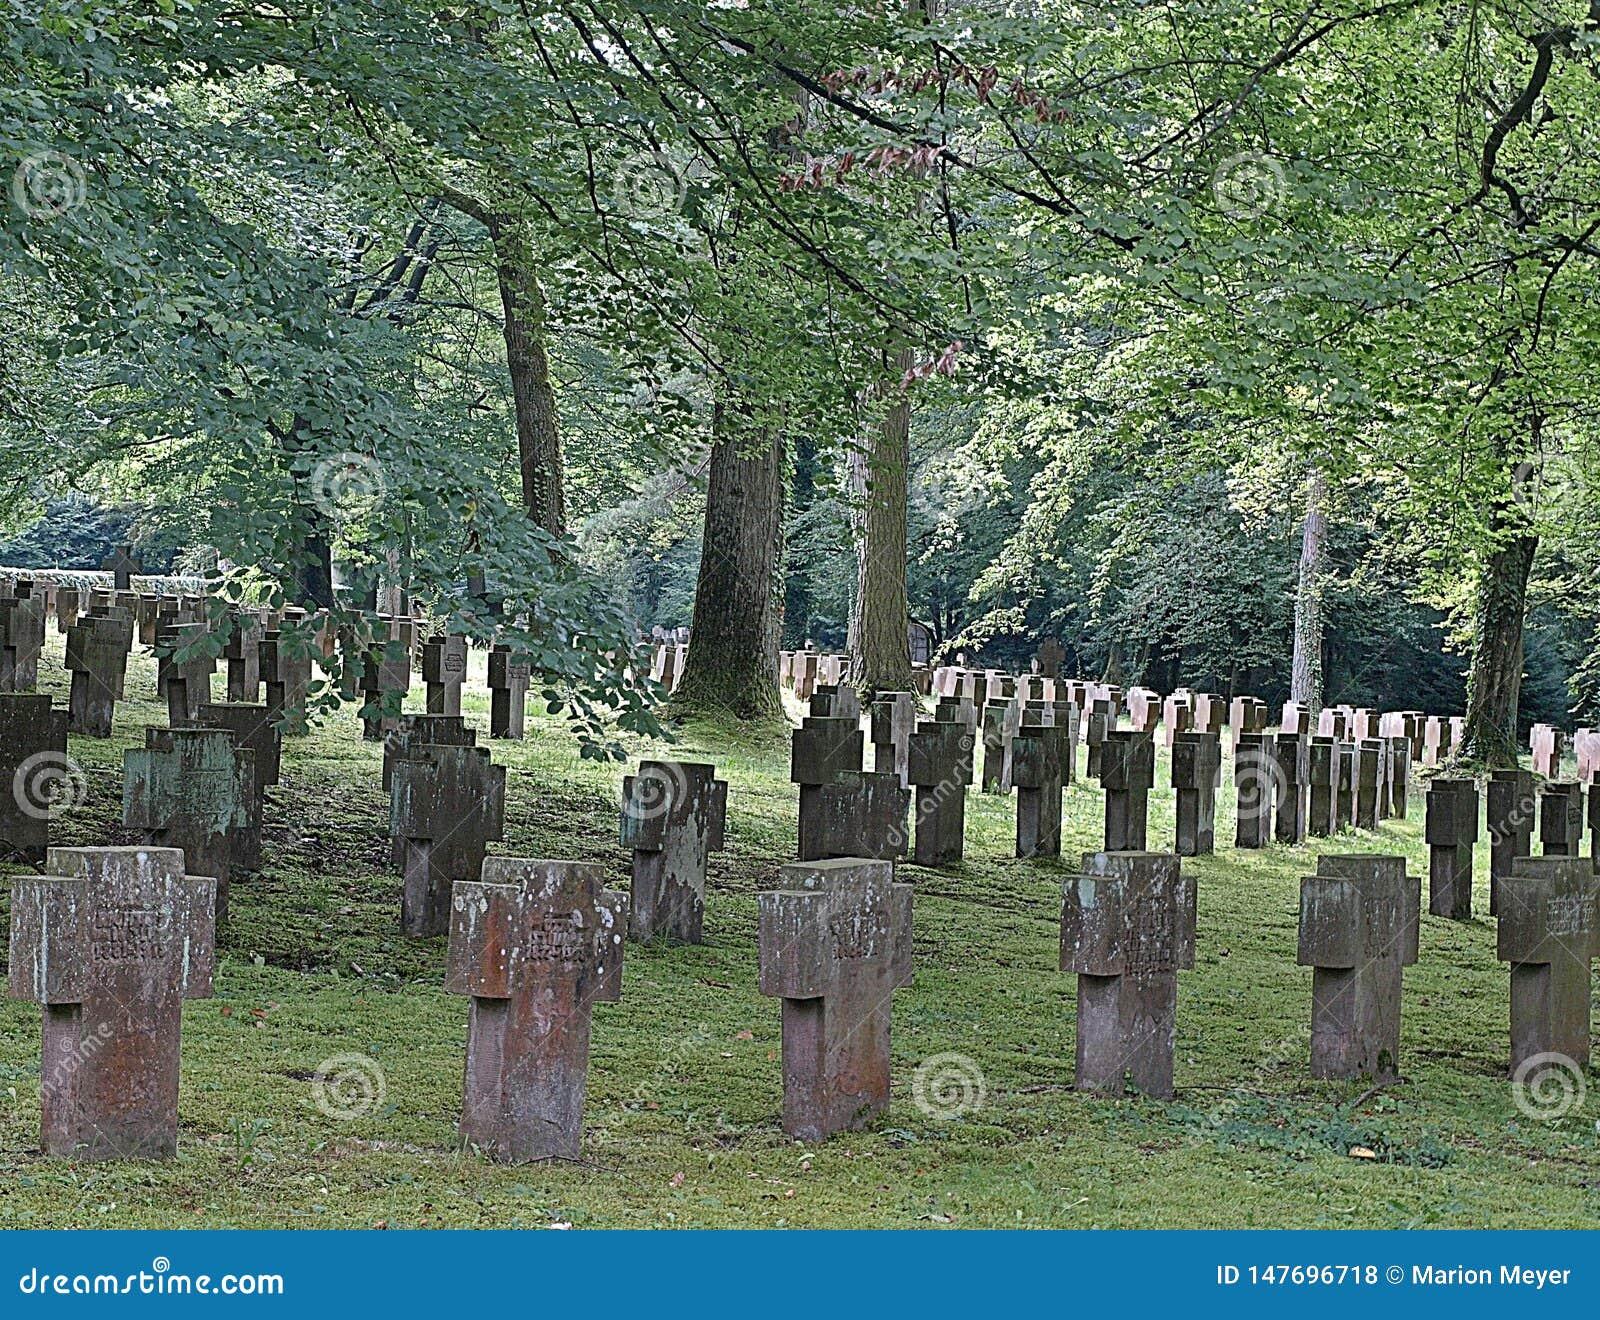 Old cemetery in stuttgart in Germany